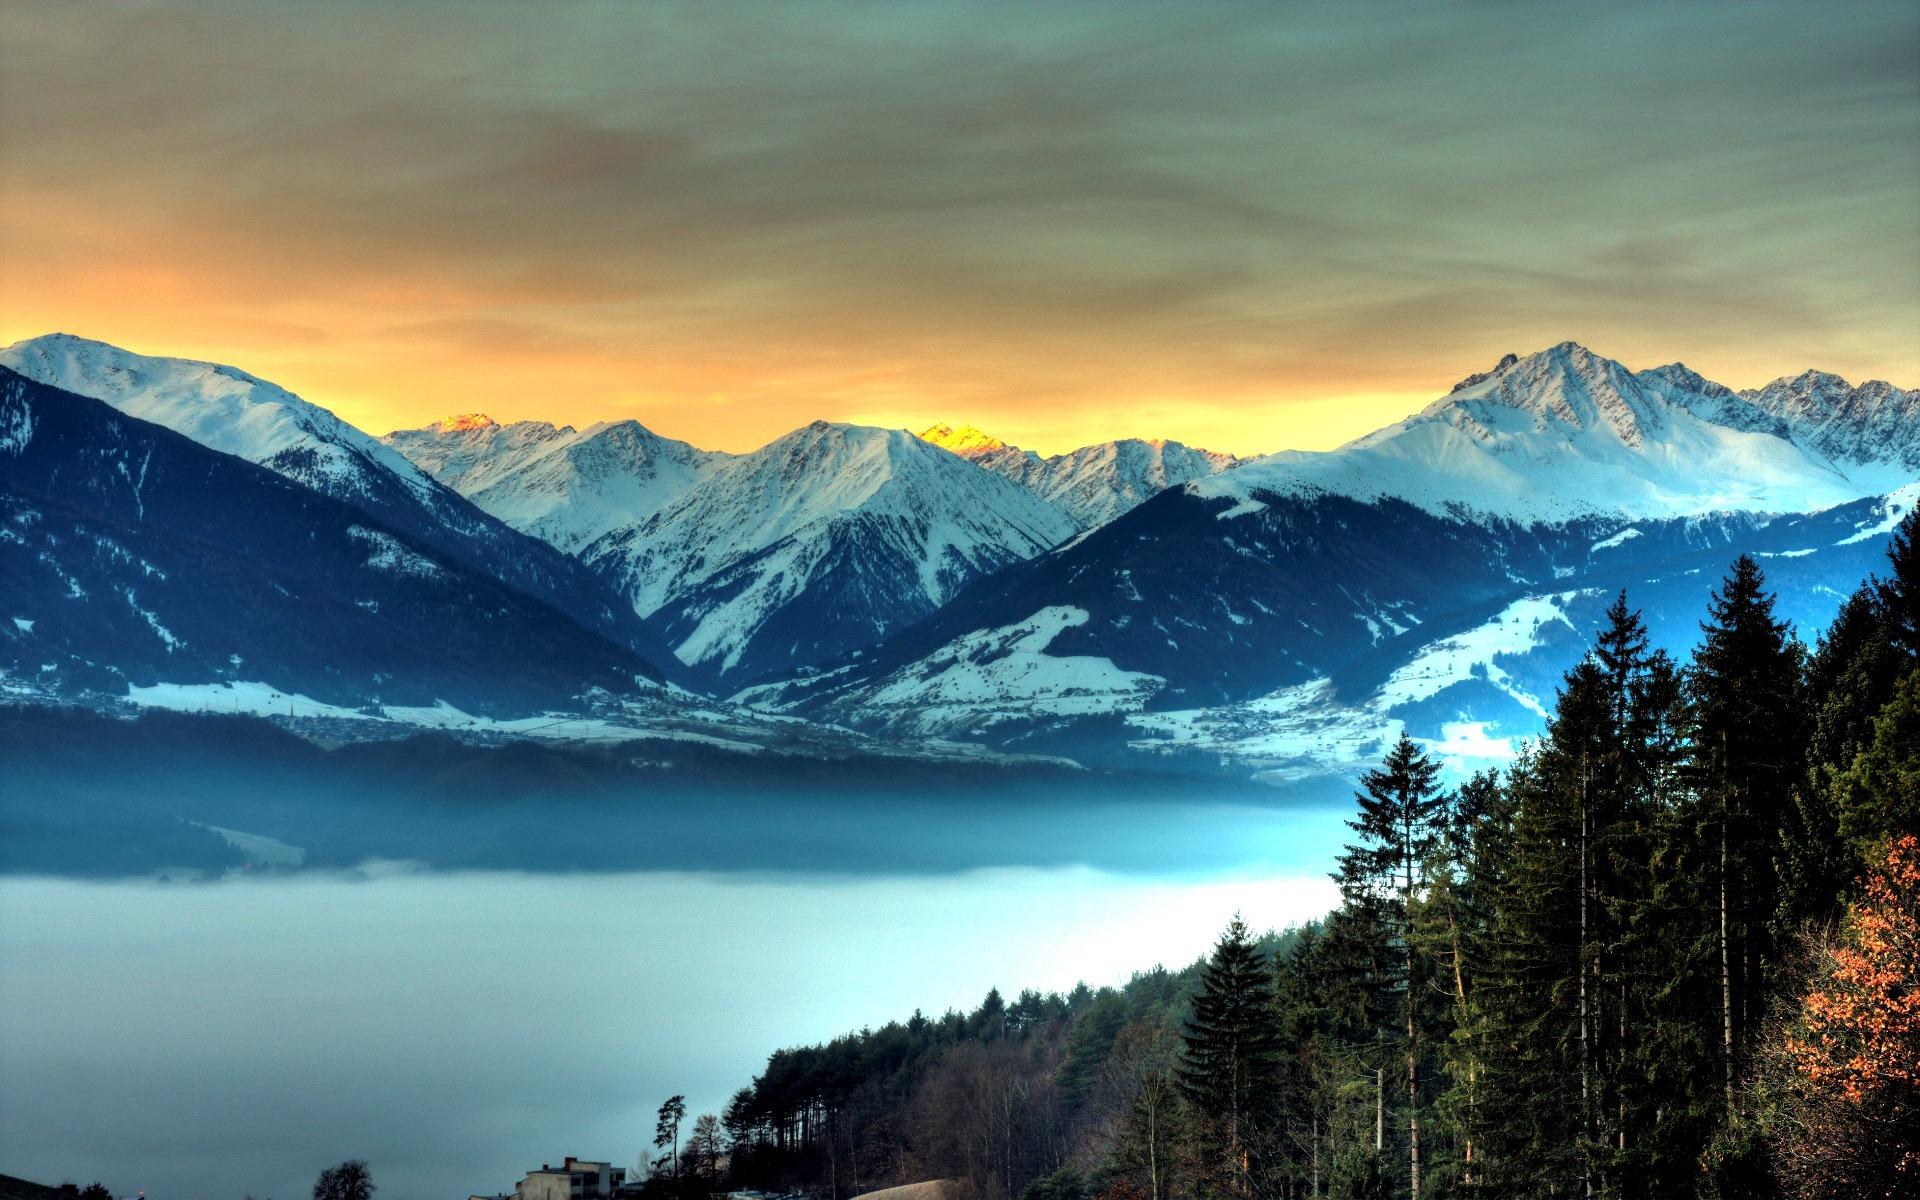 mountain bliss wallpaper landscape nature wallpapers in jpg format